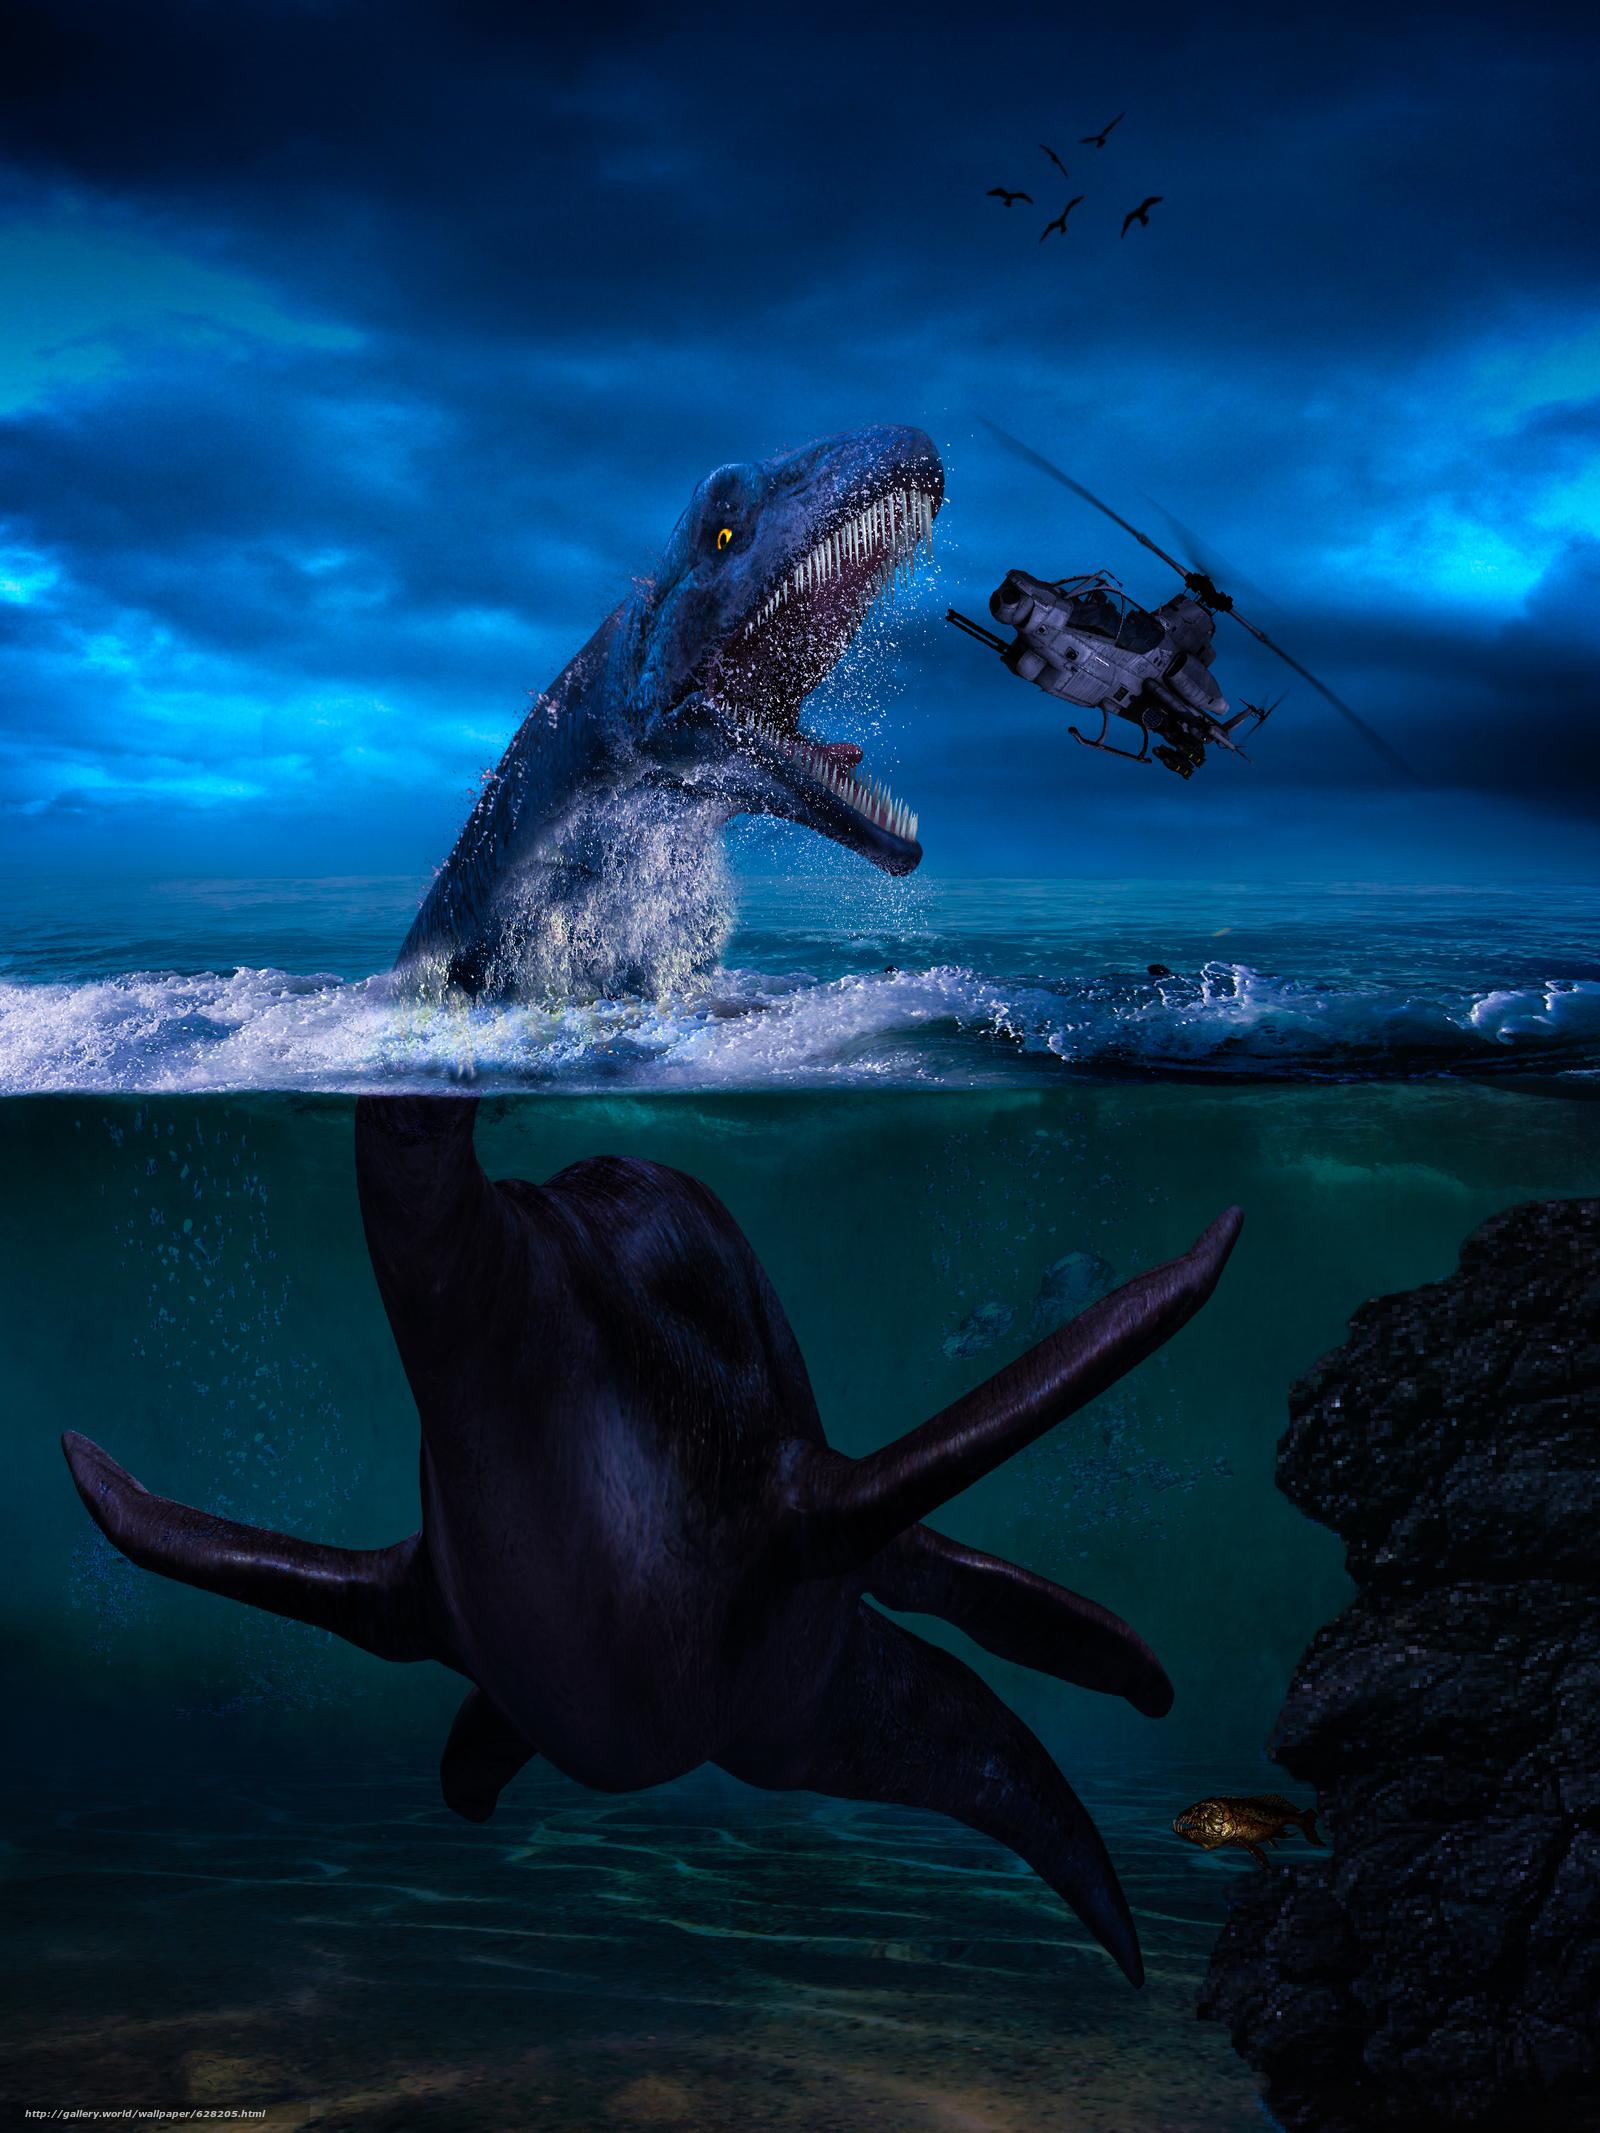 морской динозавр, вертолёт, фантастика